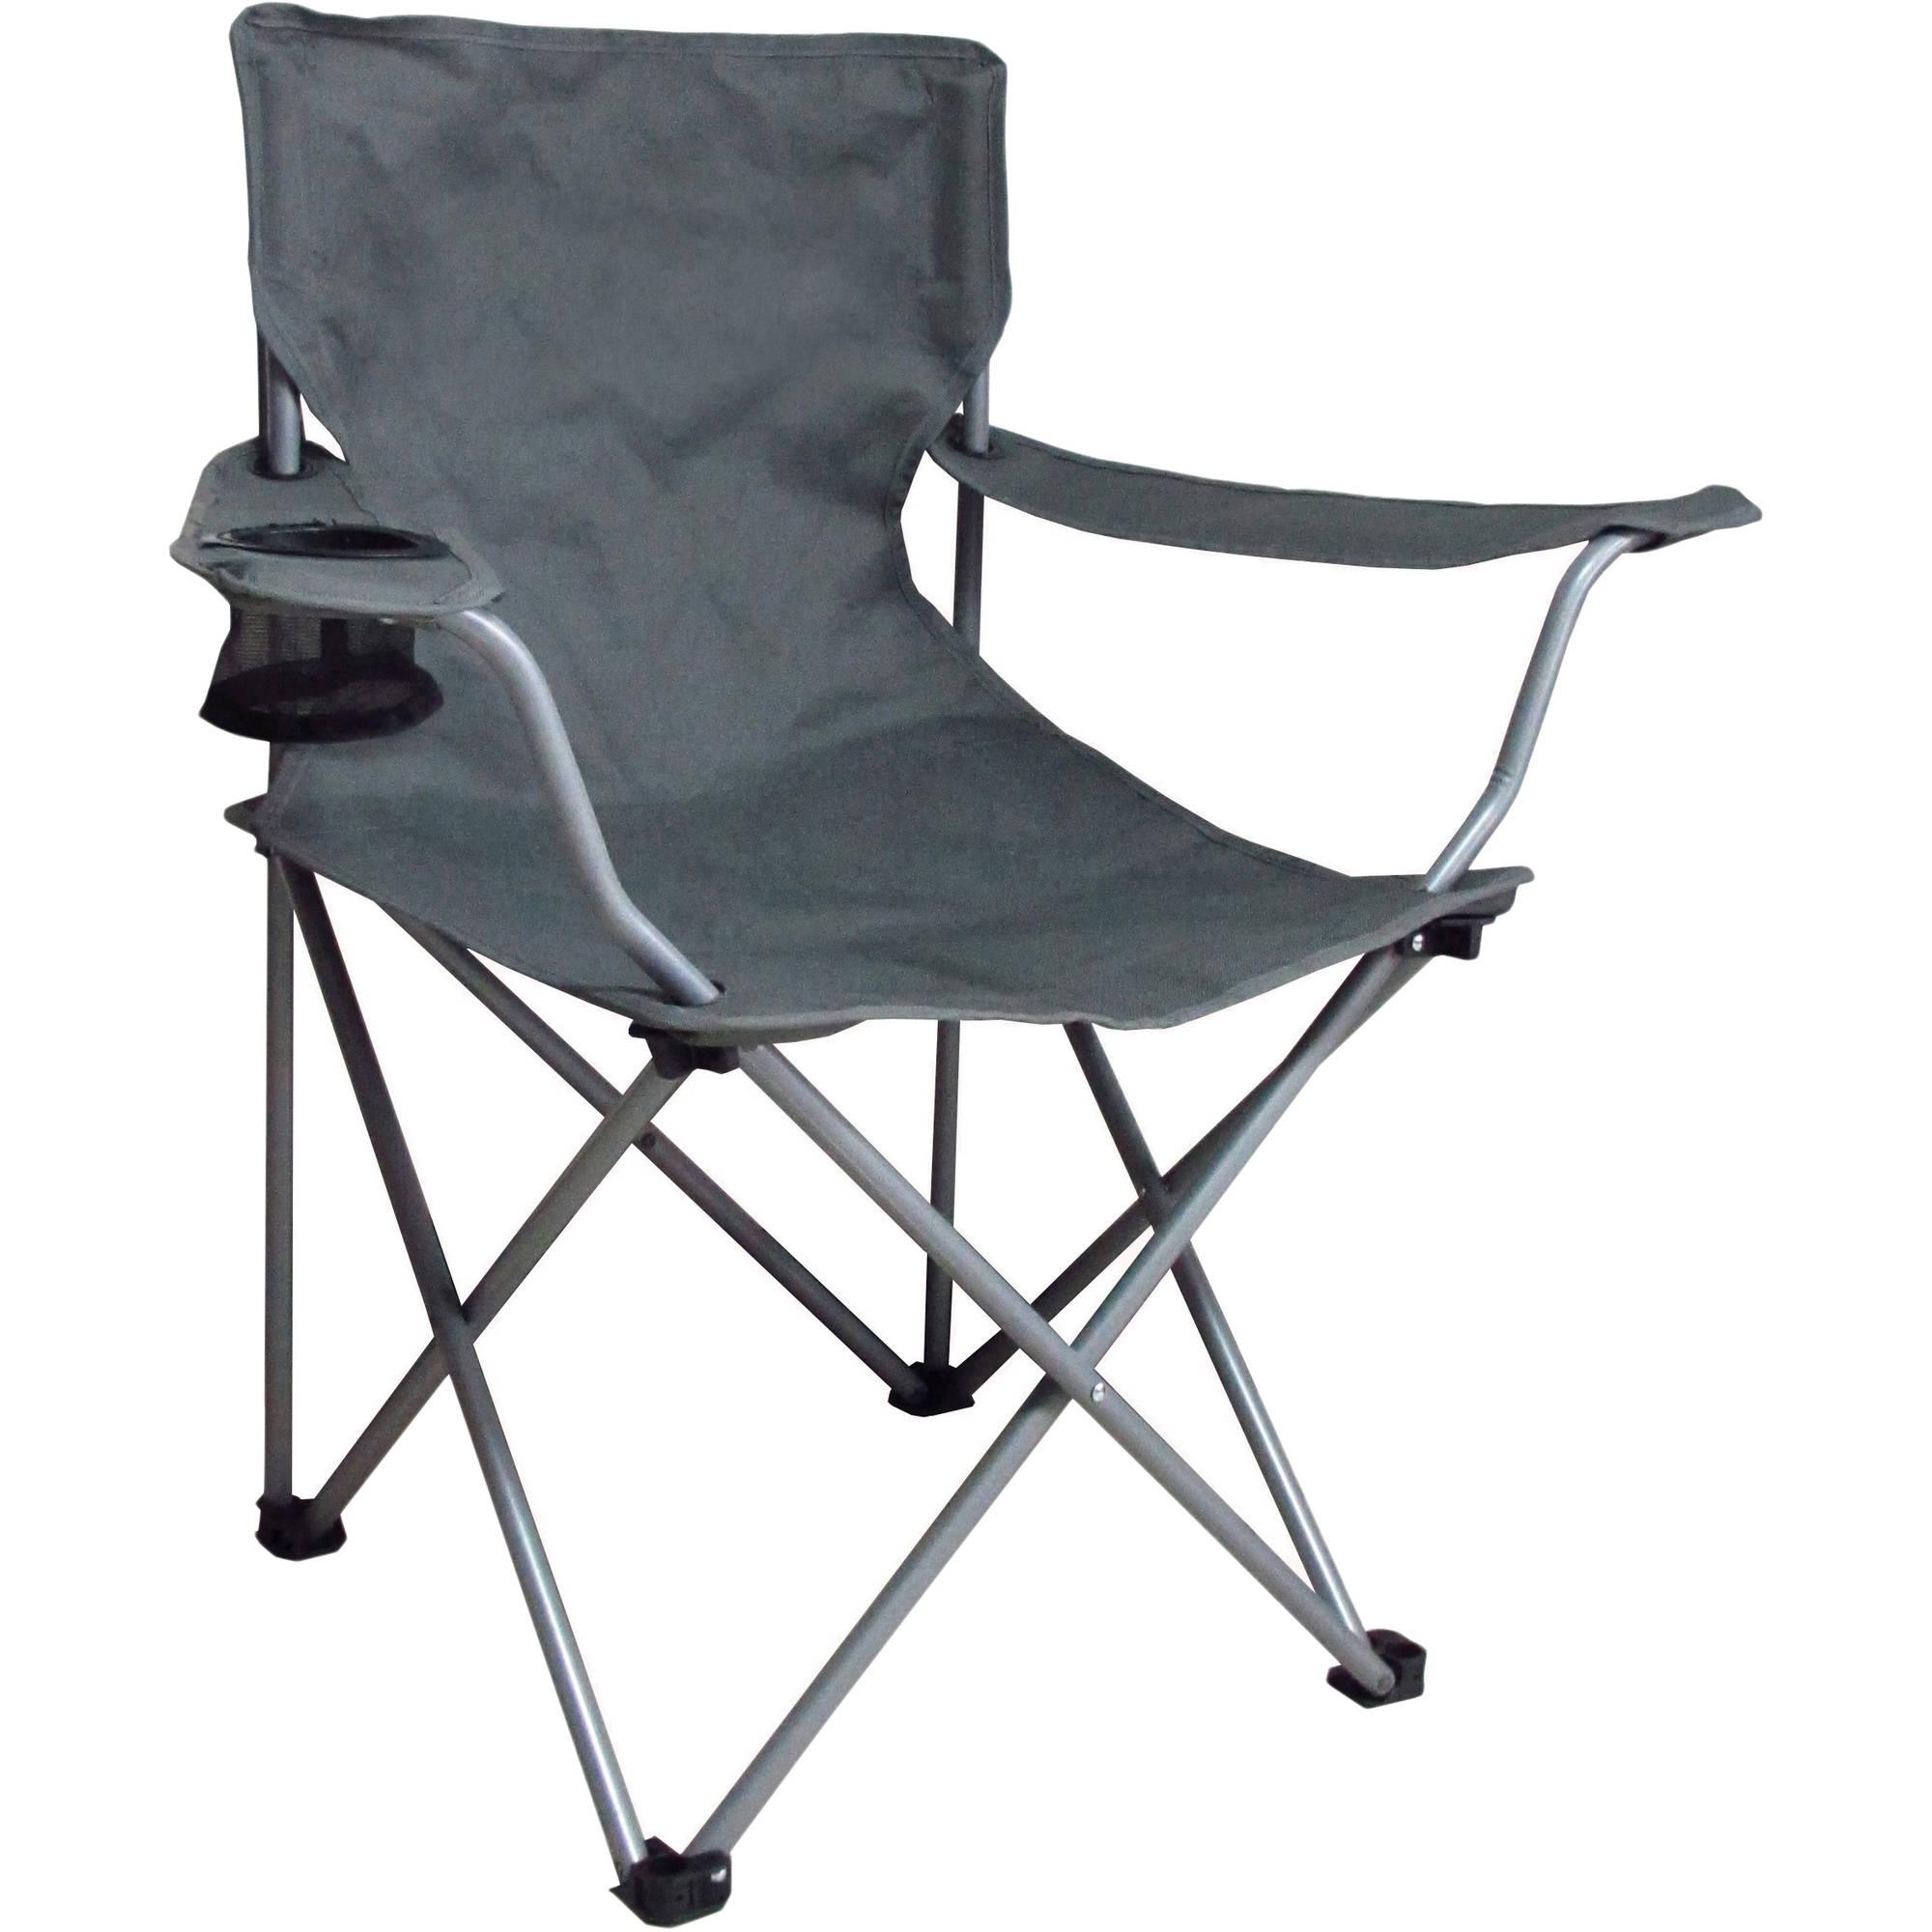 folding camping chairs ozark trail folding chair - walmart.com DAQEHYN